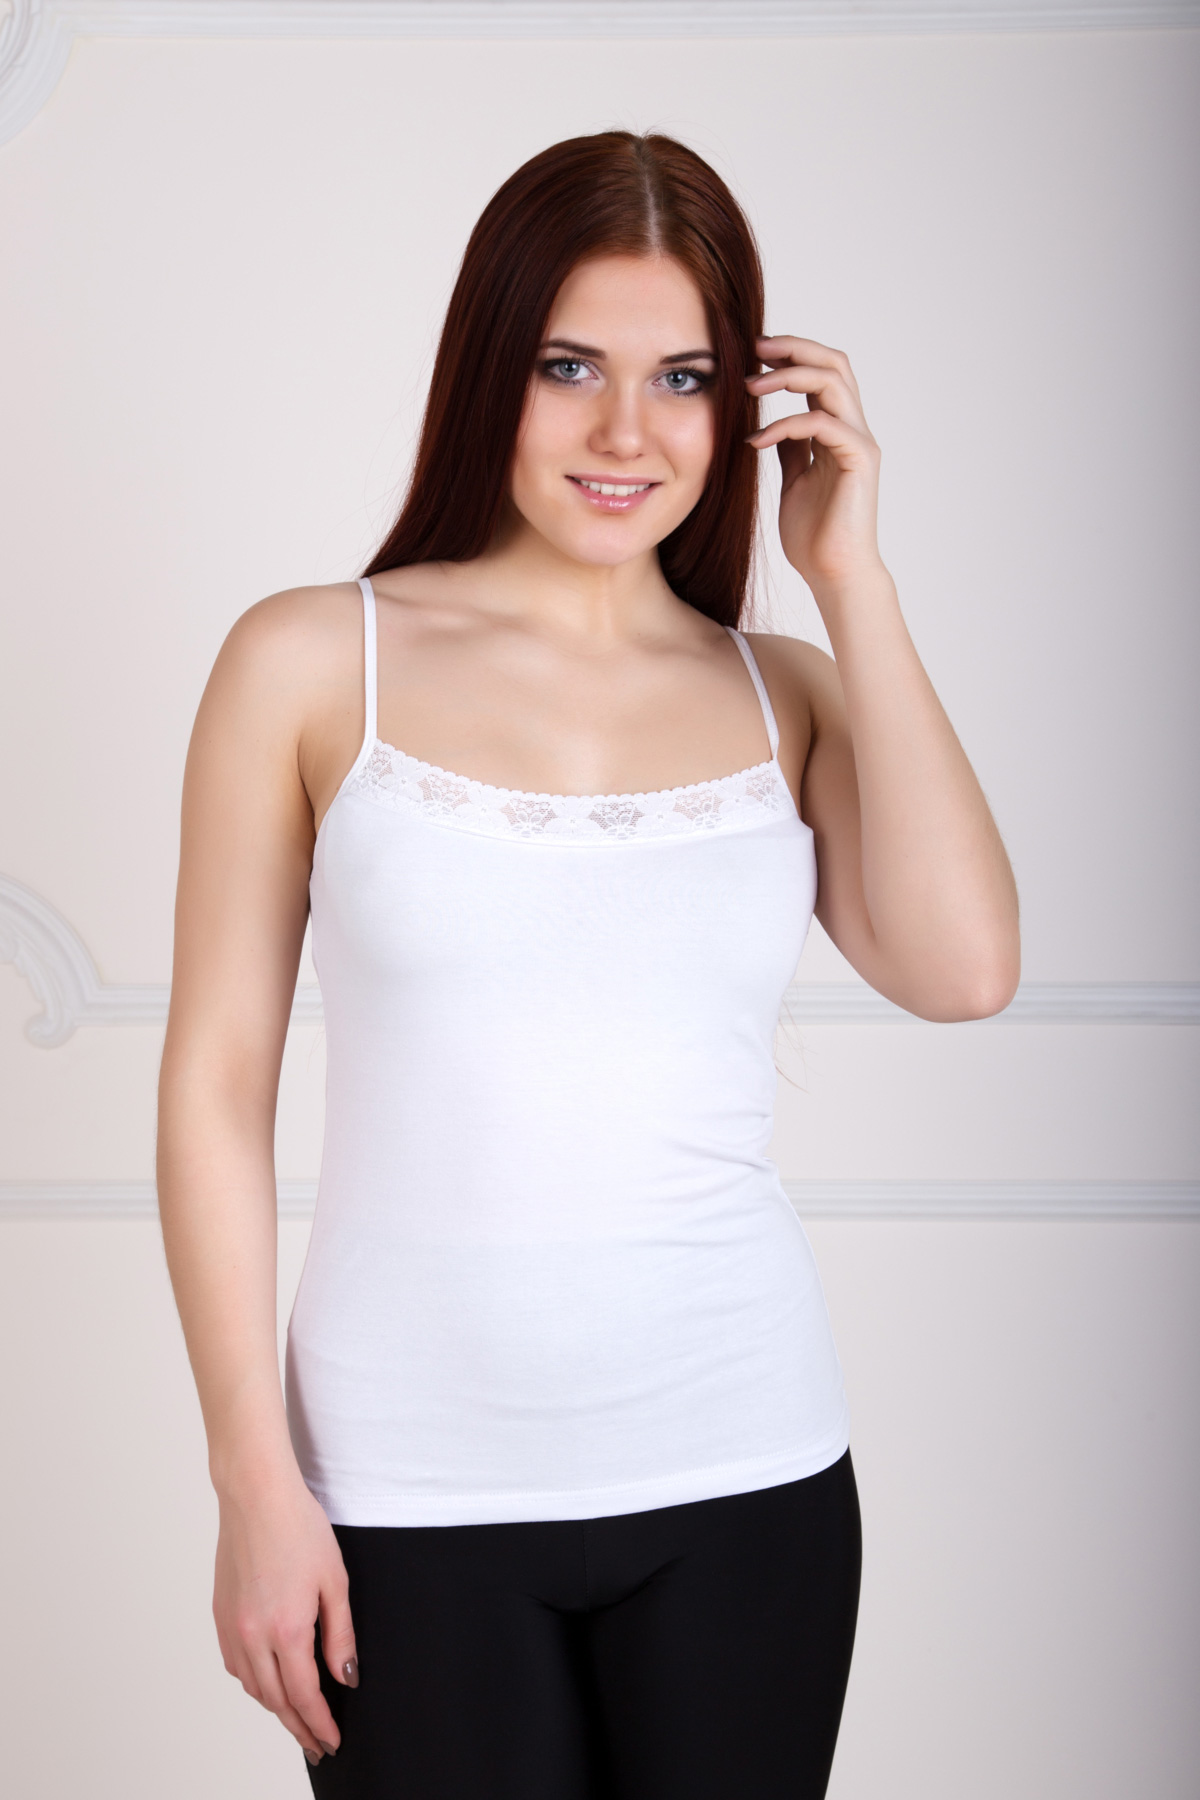 Жен. майка Бекки Белый р. 42Майки и футболки<br>Факт. ОГ: 62 см <br>Факт. ОТ: 68 см <br>Факт. ОБ: 76 см <br>Длина по спинке: 57 см<br><br>Тип: Жен. майка<br>Размер: 42<br>Материал: Фулайкра